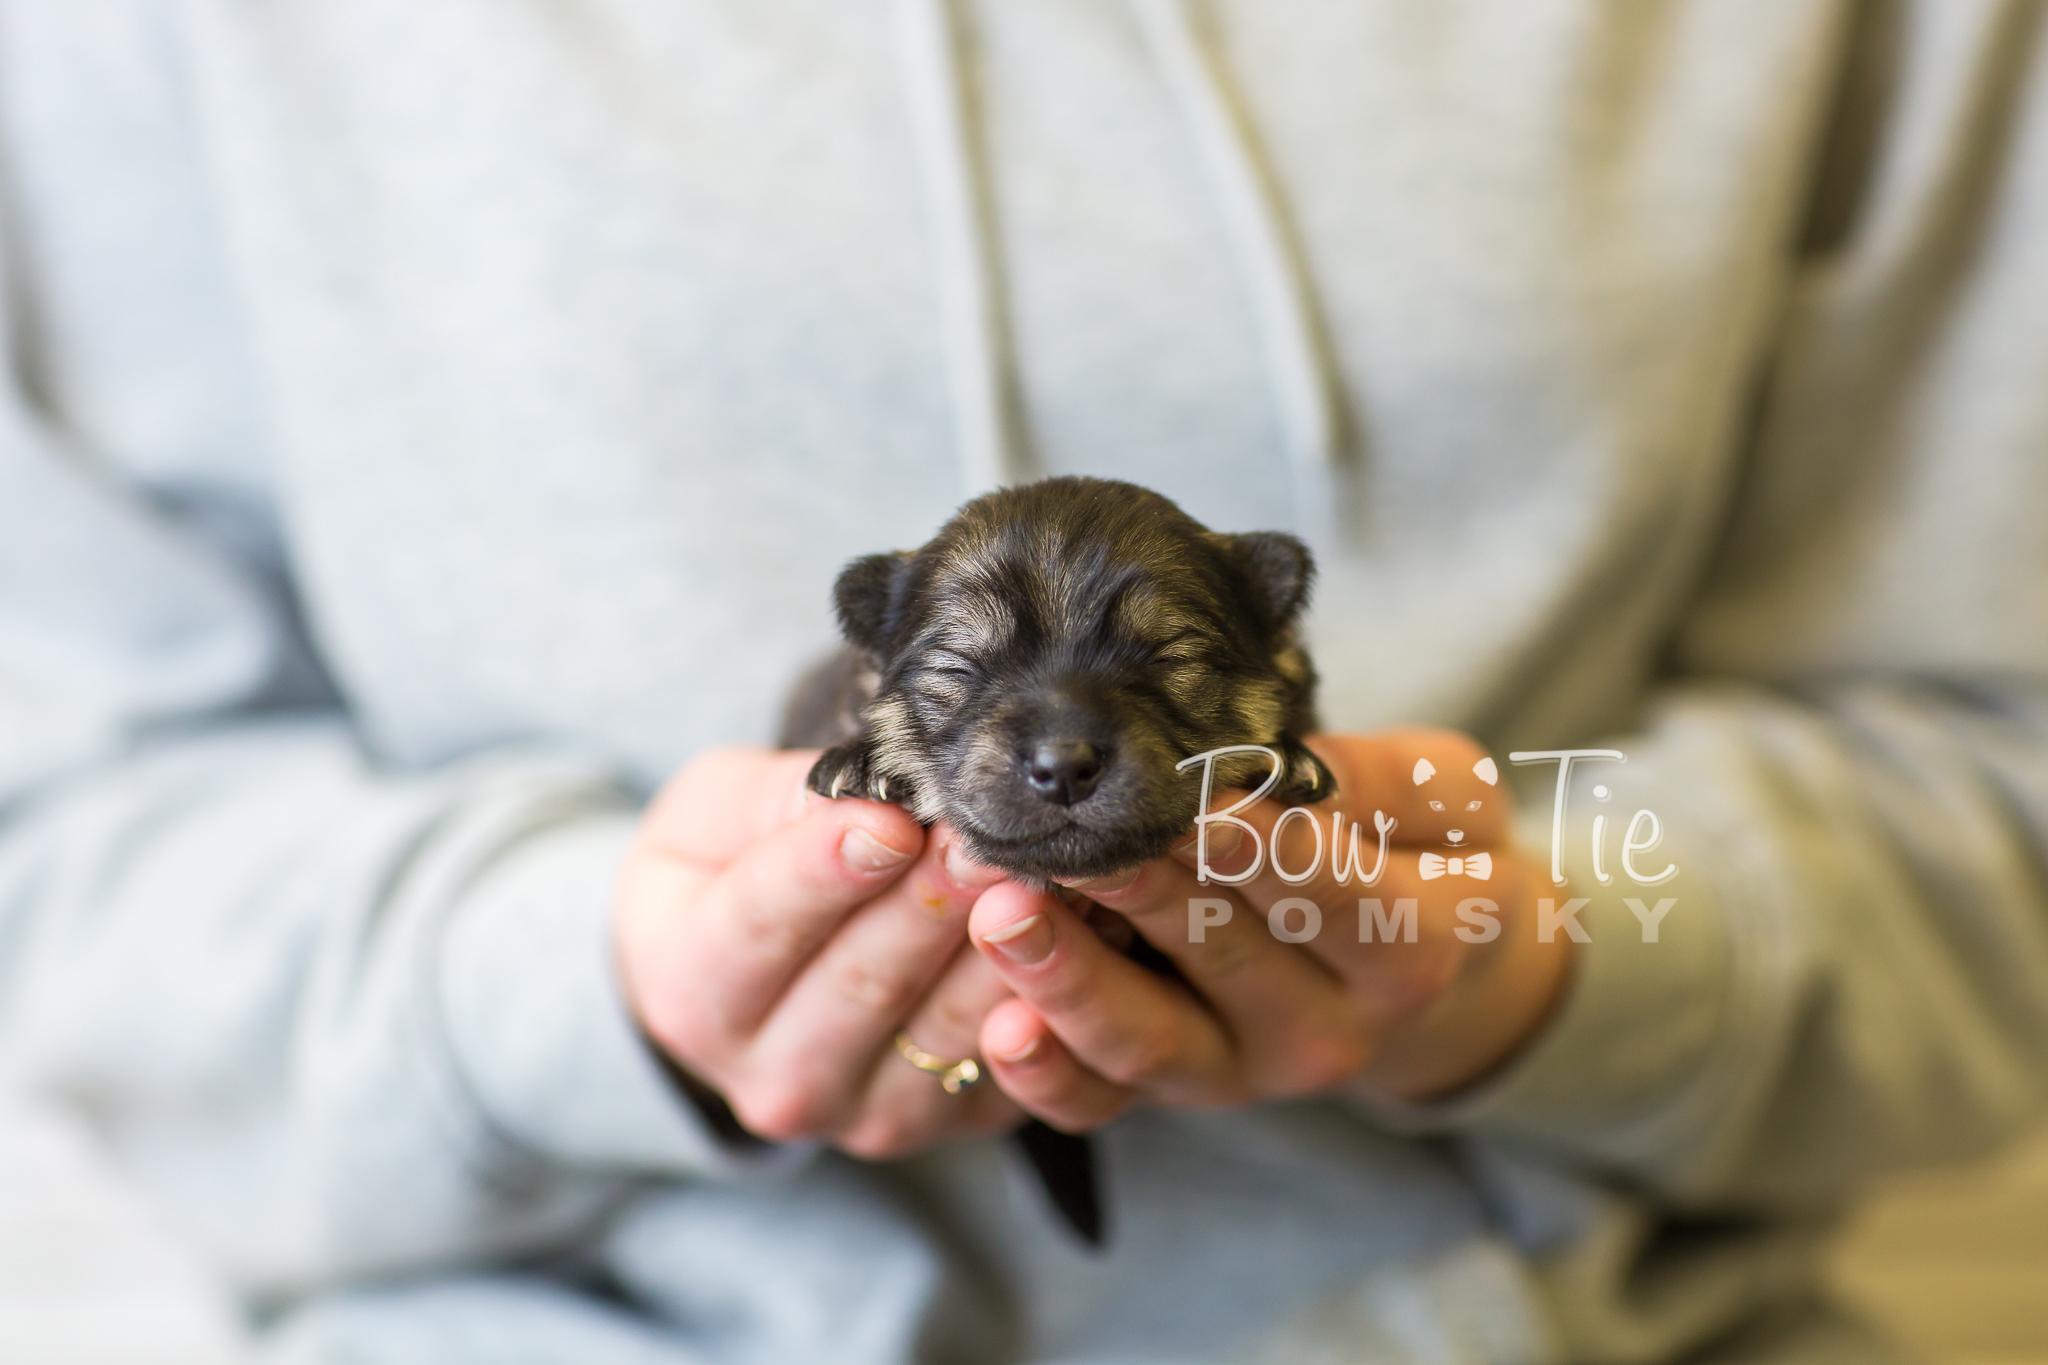 1st Gen Puppy 42 Girl Bowtie Pomsky Llc